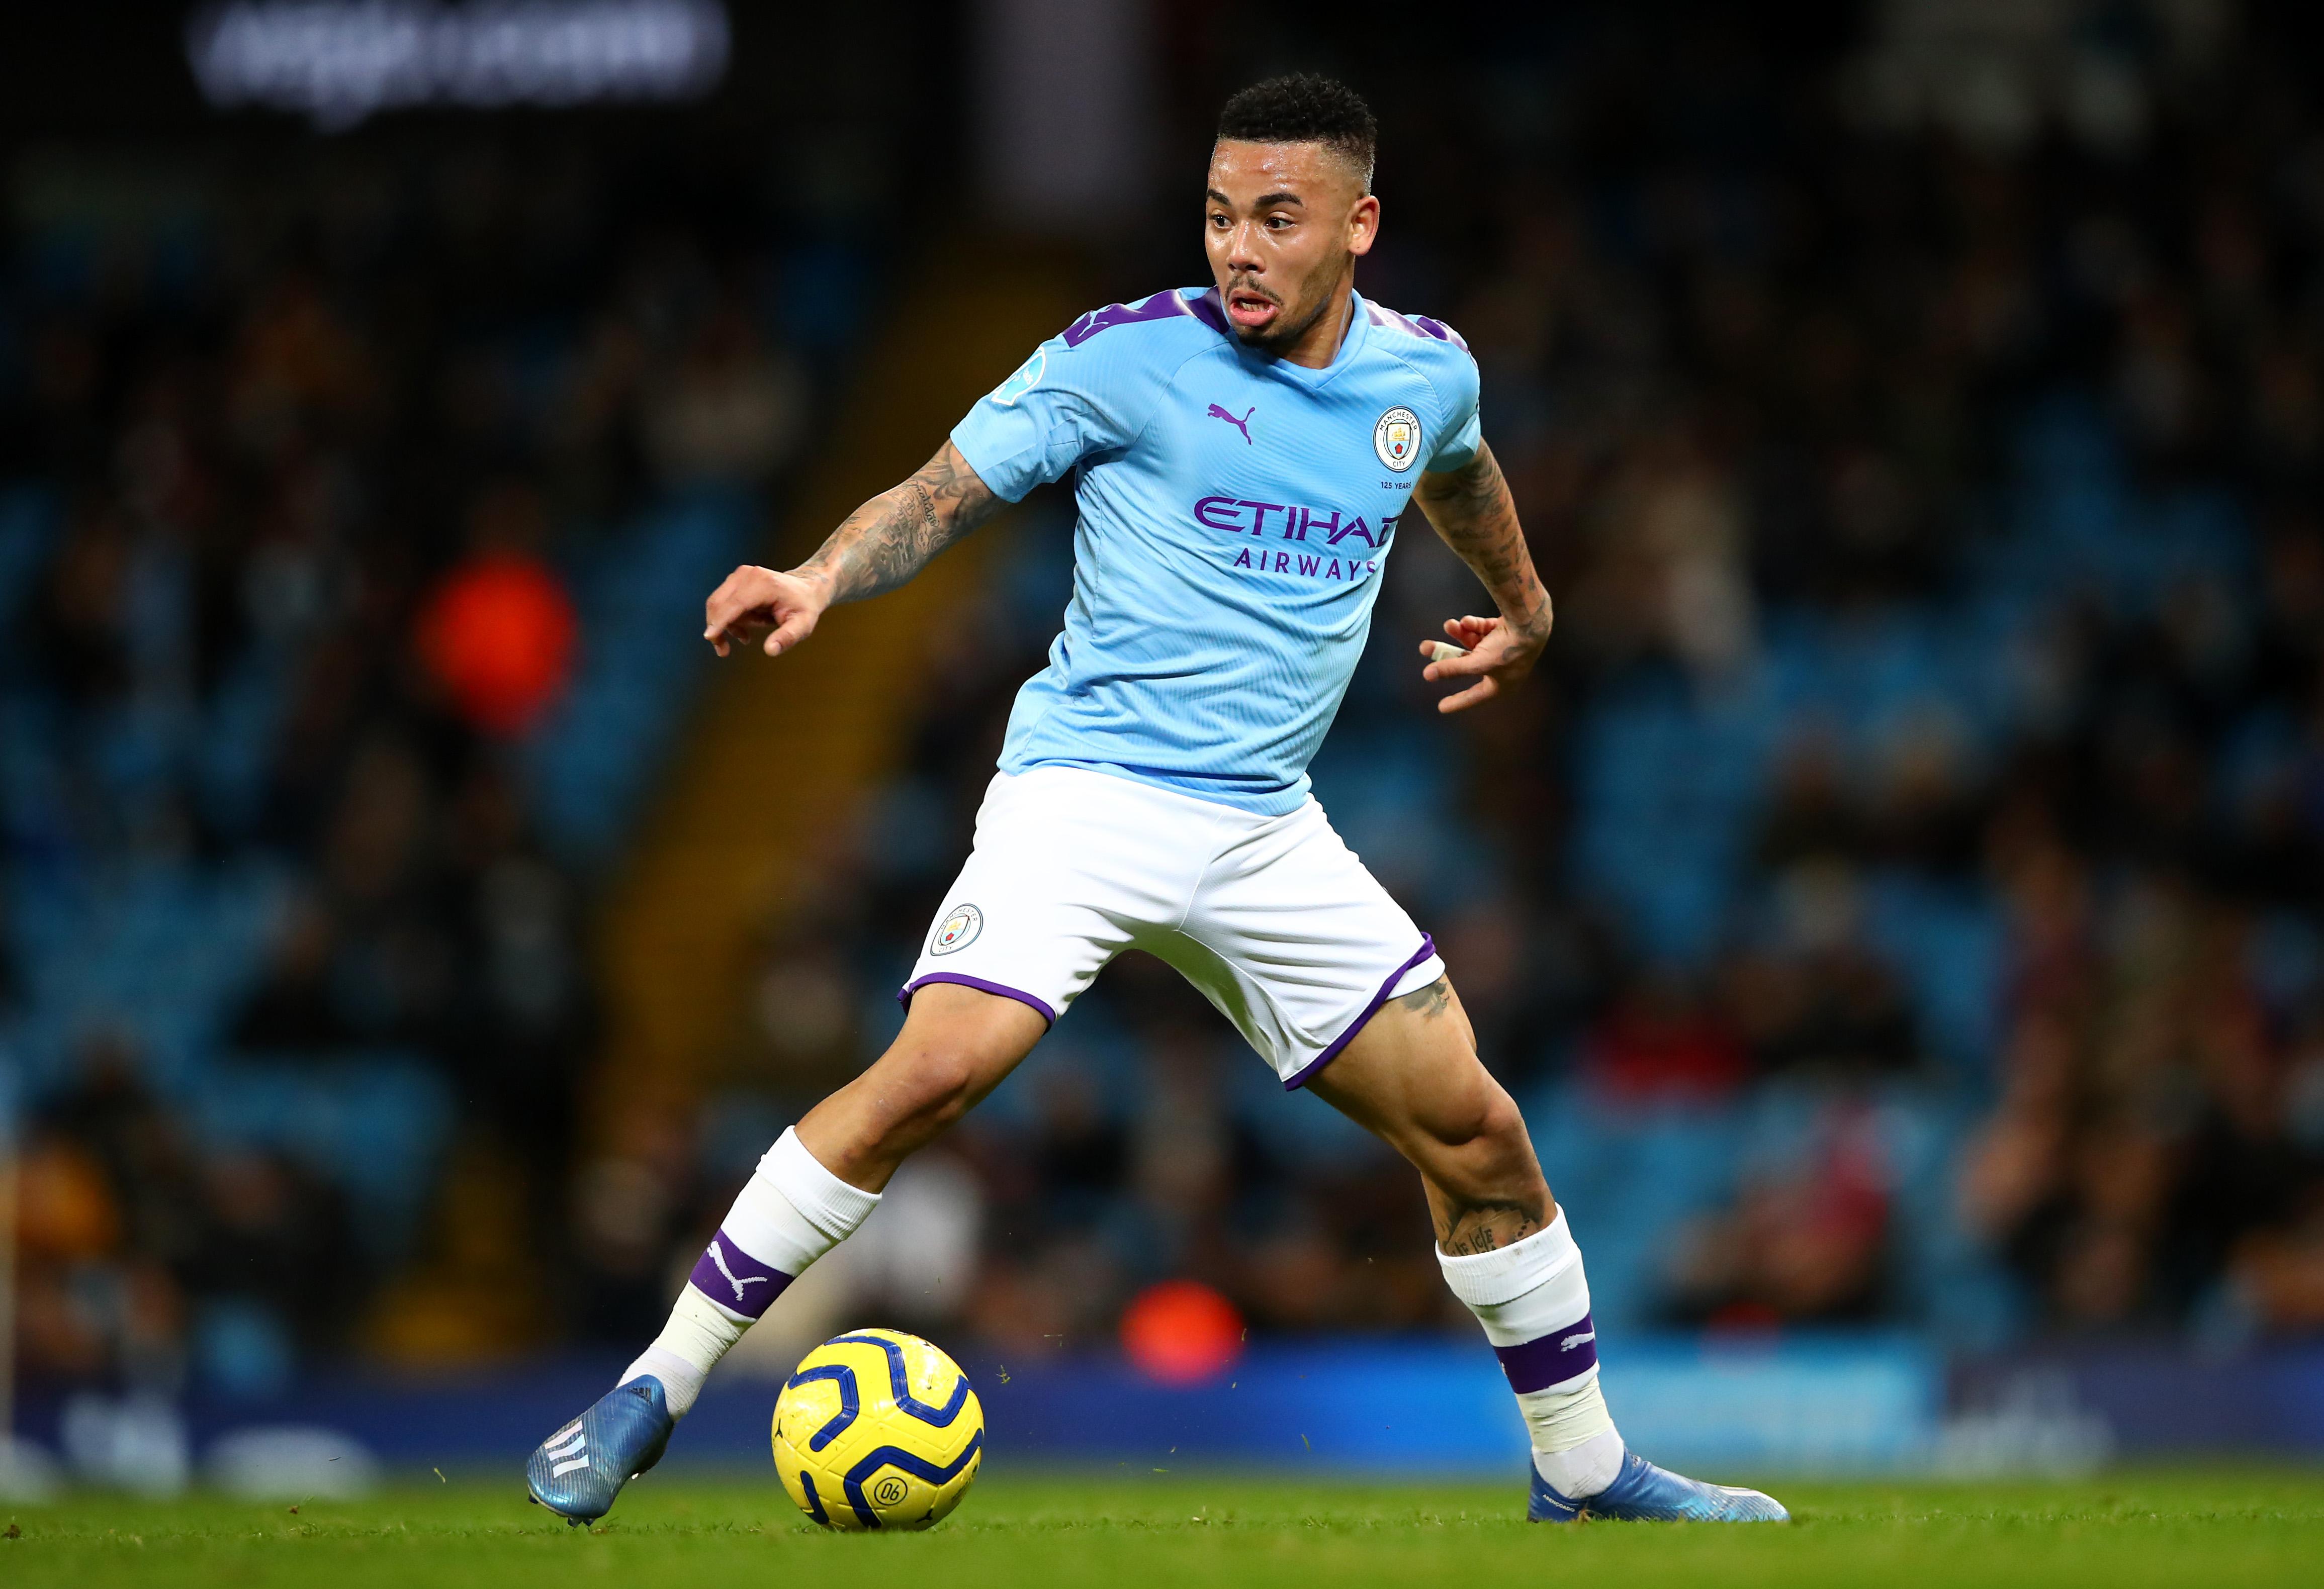 manchester city v west ham united premier league - Manchester City vs Liverpool Predicted Line-ups, TV Channel, Live Stream